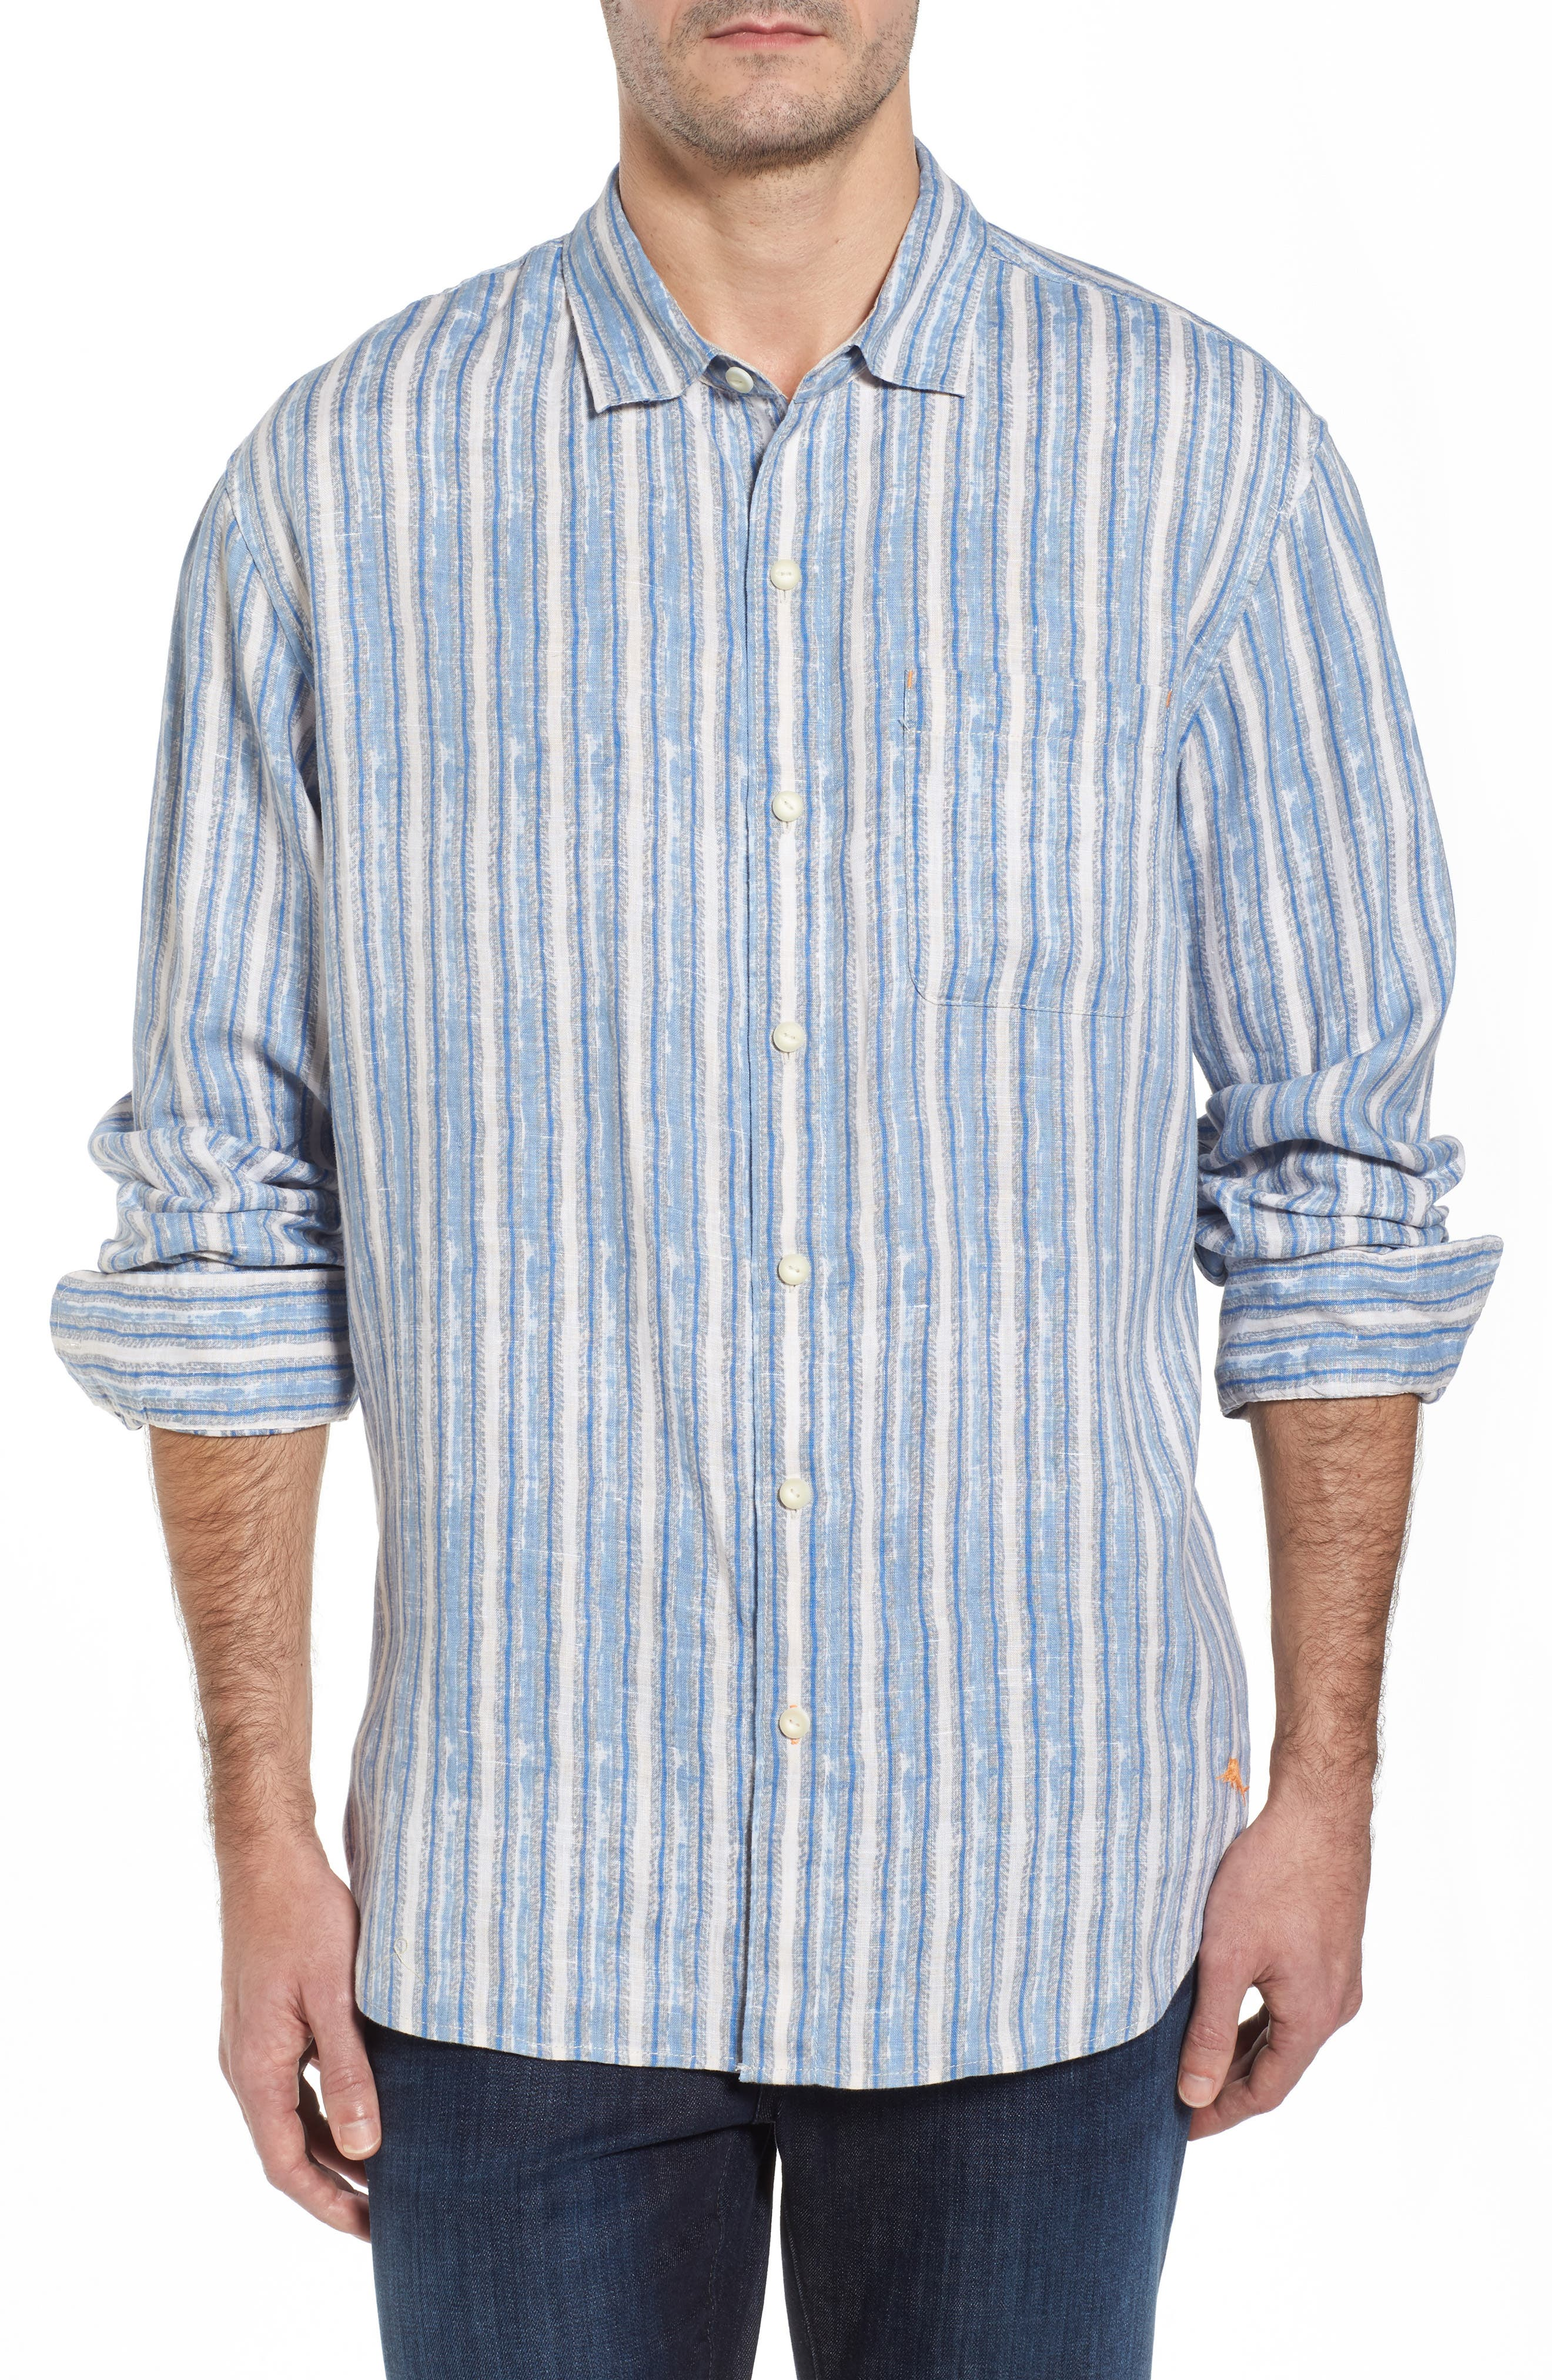 Along Shore Stripe Linen Sport Shirt,                             Main thumbnail 1, color,                             Fjord